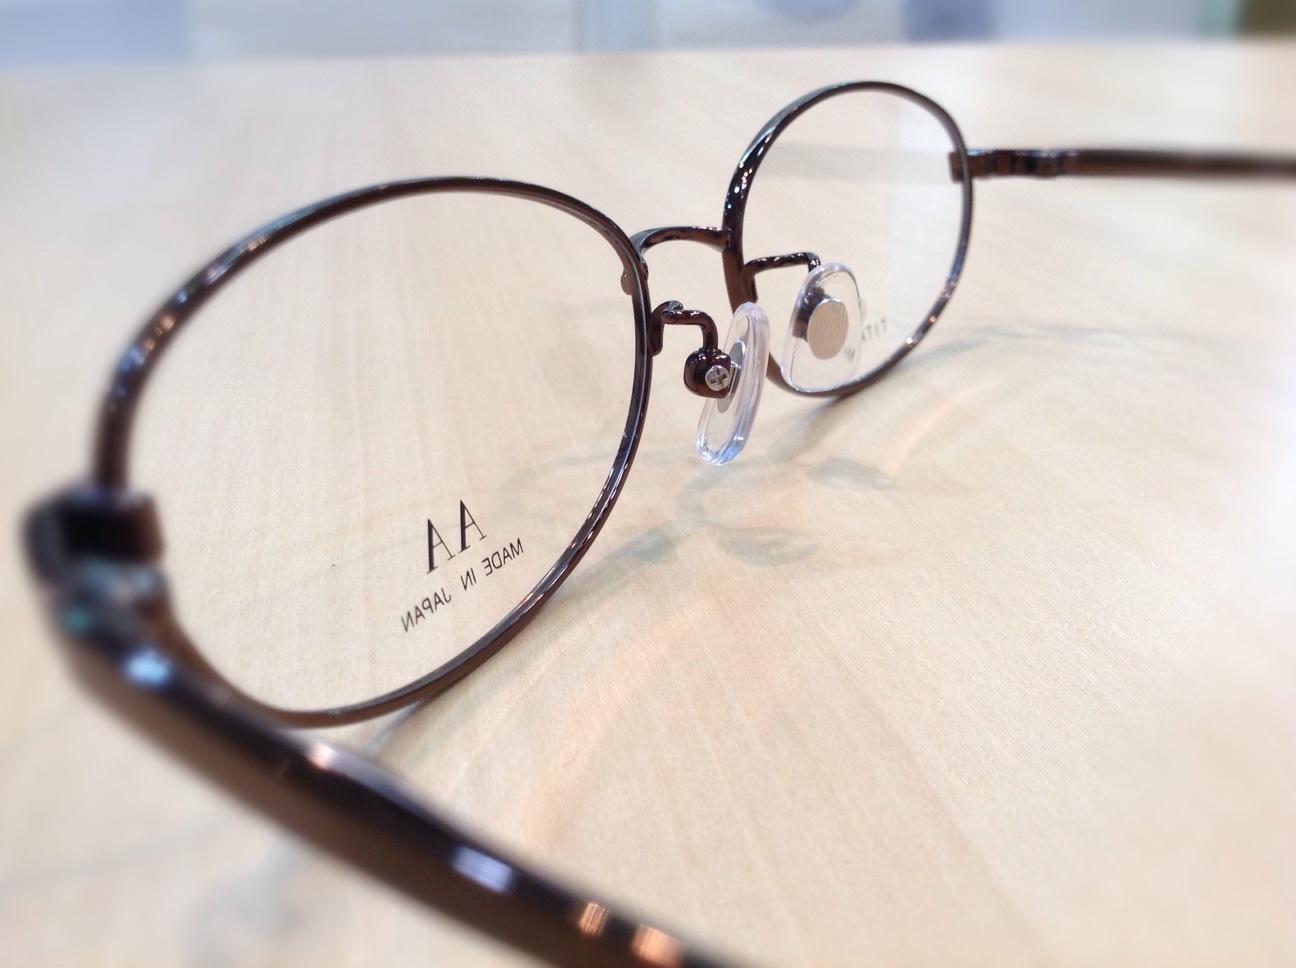 AA(ダブルエー) 品番:AA-18104 カラー:6 レンズサイズ:52ミリ